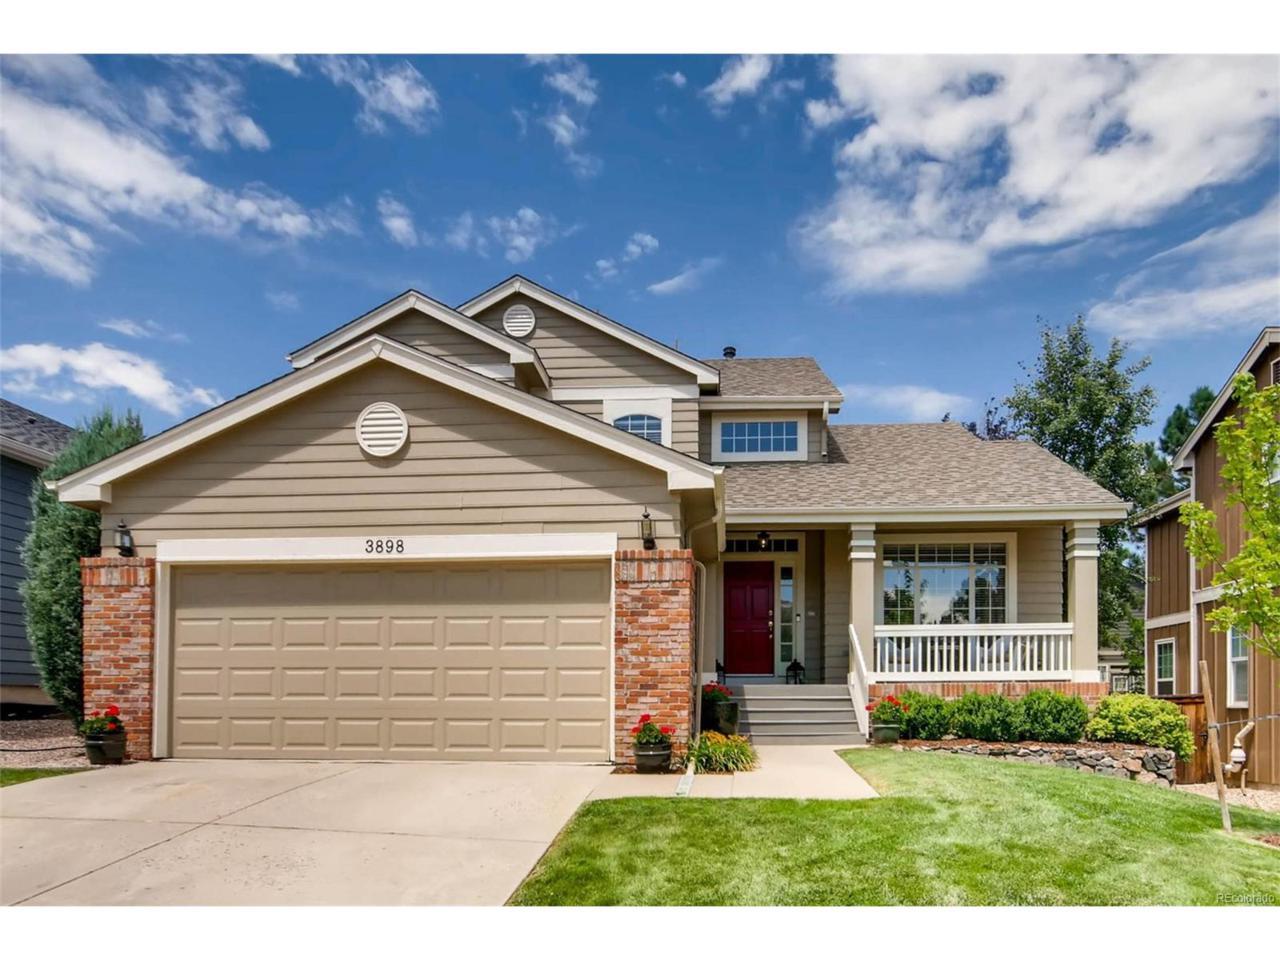 3898 Mallard Street, Highlands Ranch, CO 80126 (MLS #9413229) :: 8z Real Estate